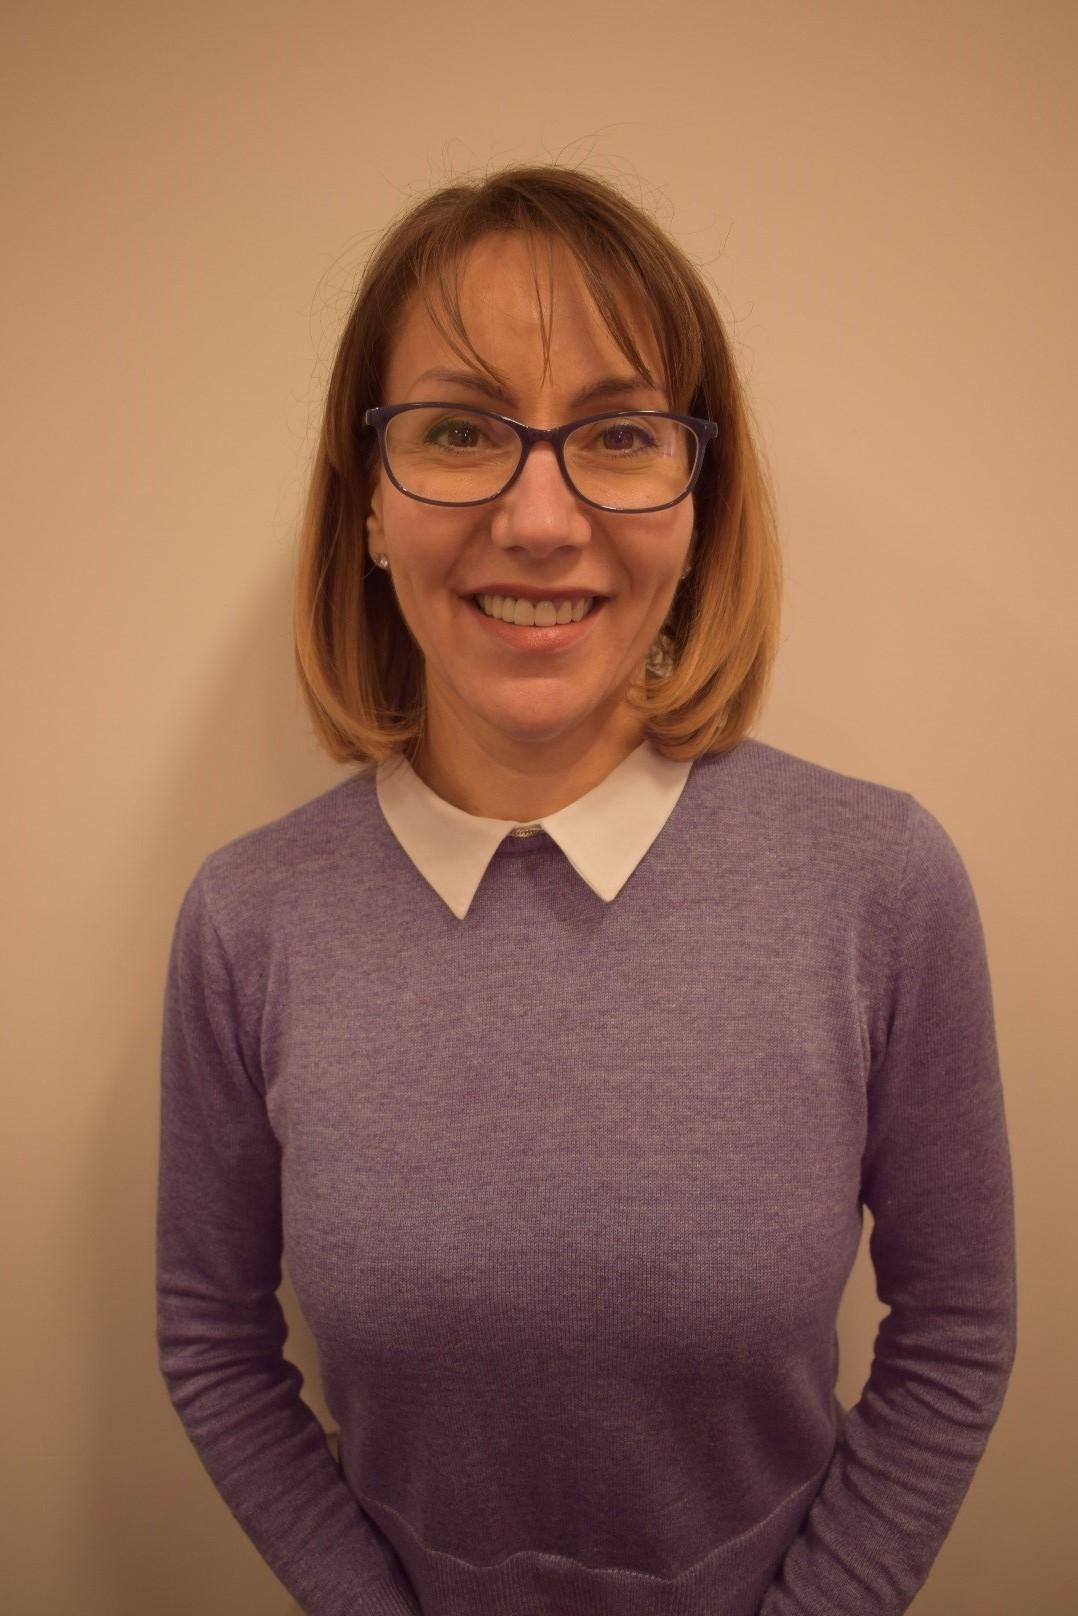 Anita Horvath